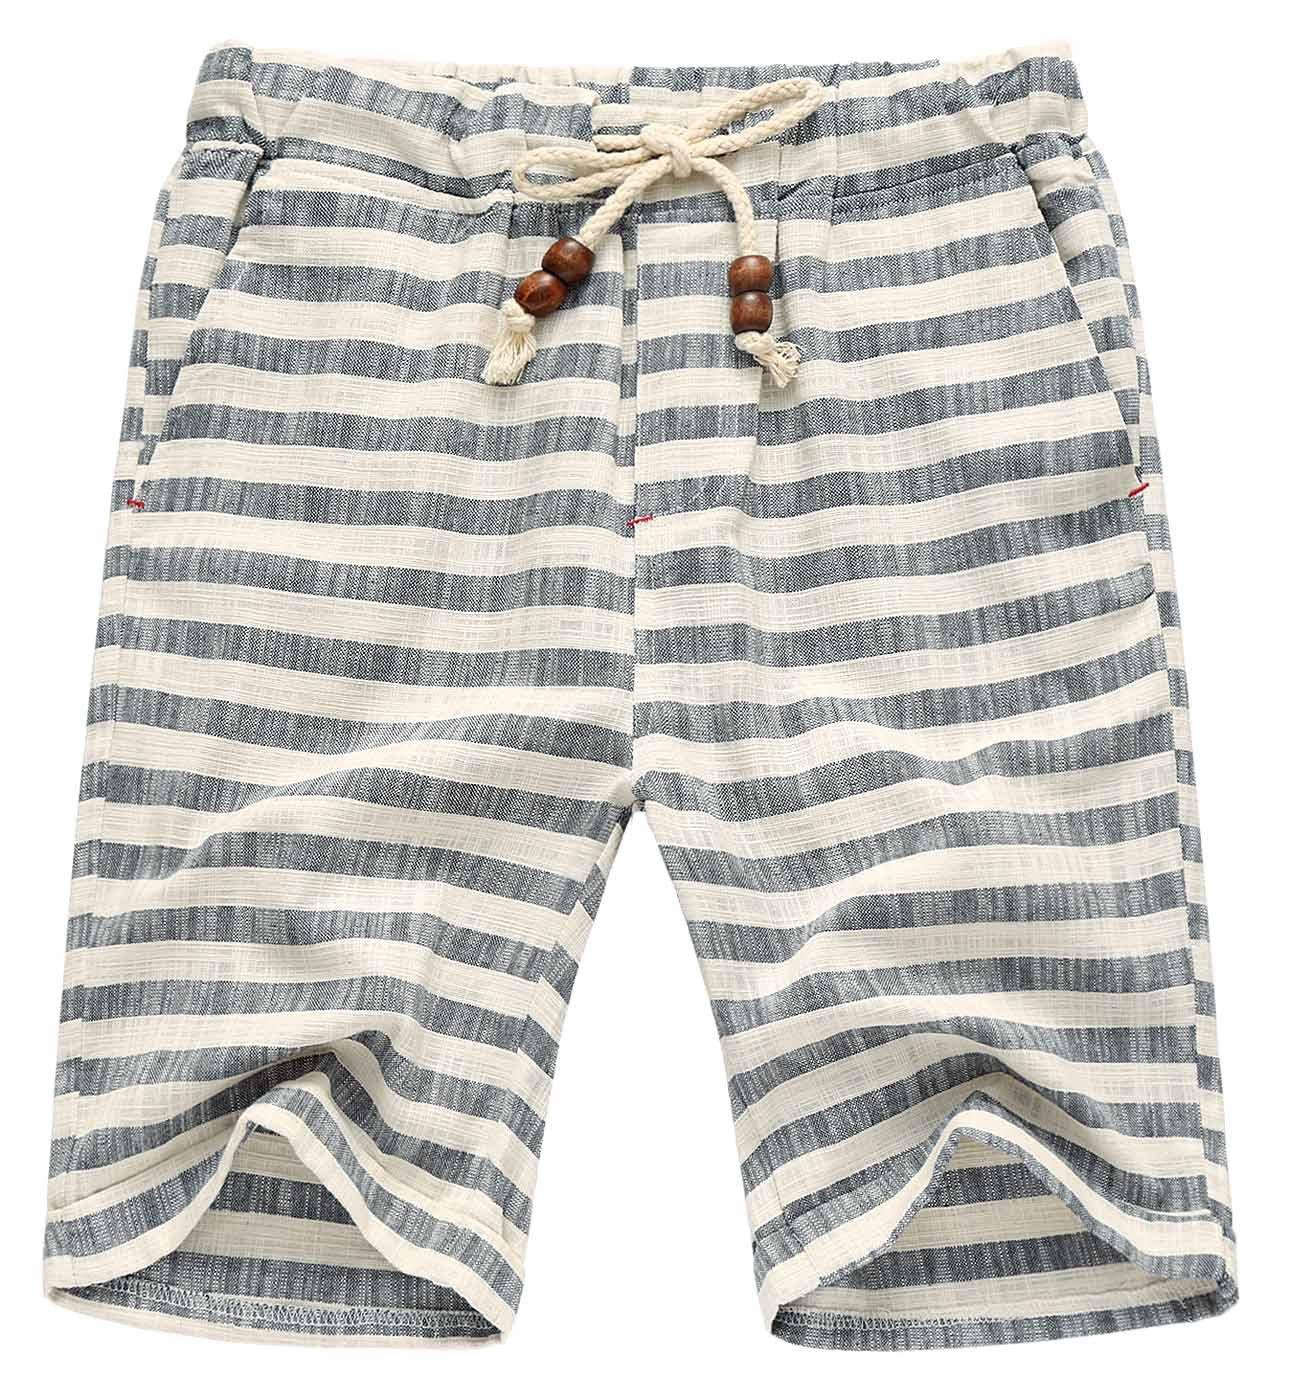 AIEOE Men Jogger Shorts Soft Comfortable Quick Drying Bathing Pool Swim Trunks Slant Pockets Drawstring 34 Stripe Grey